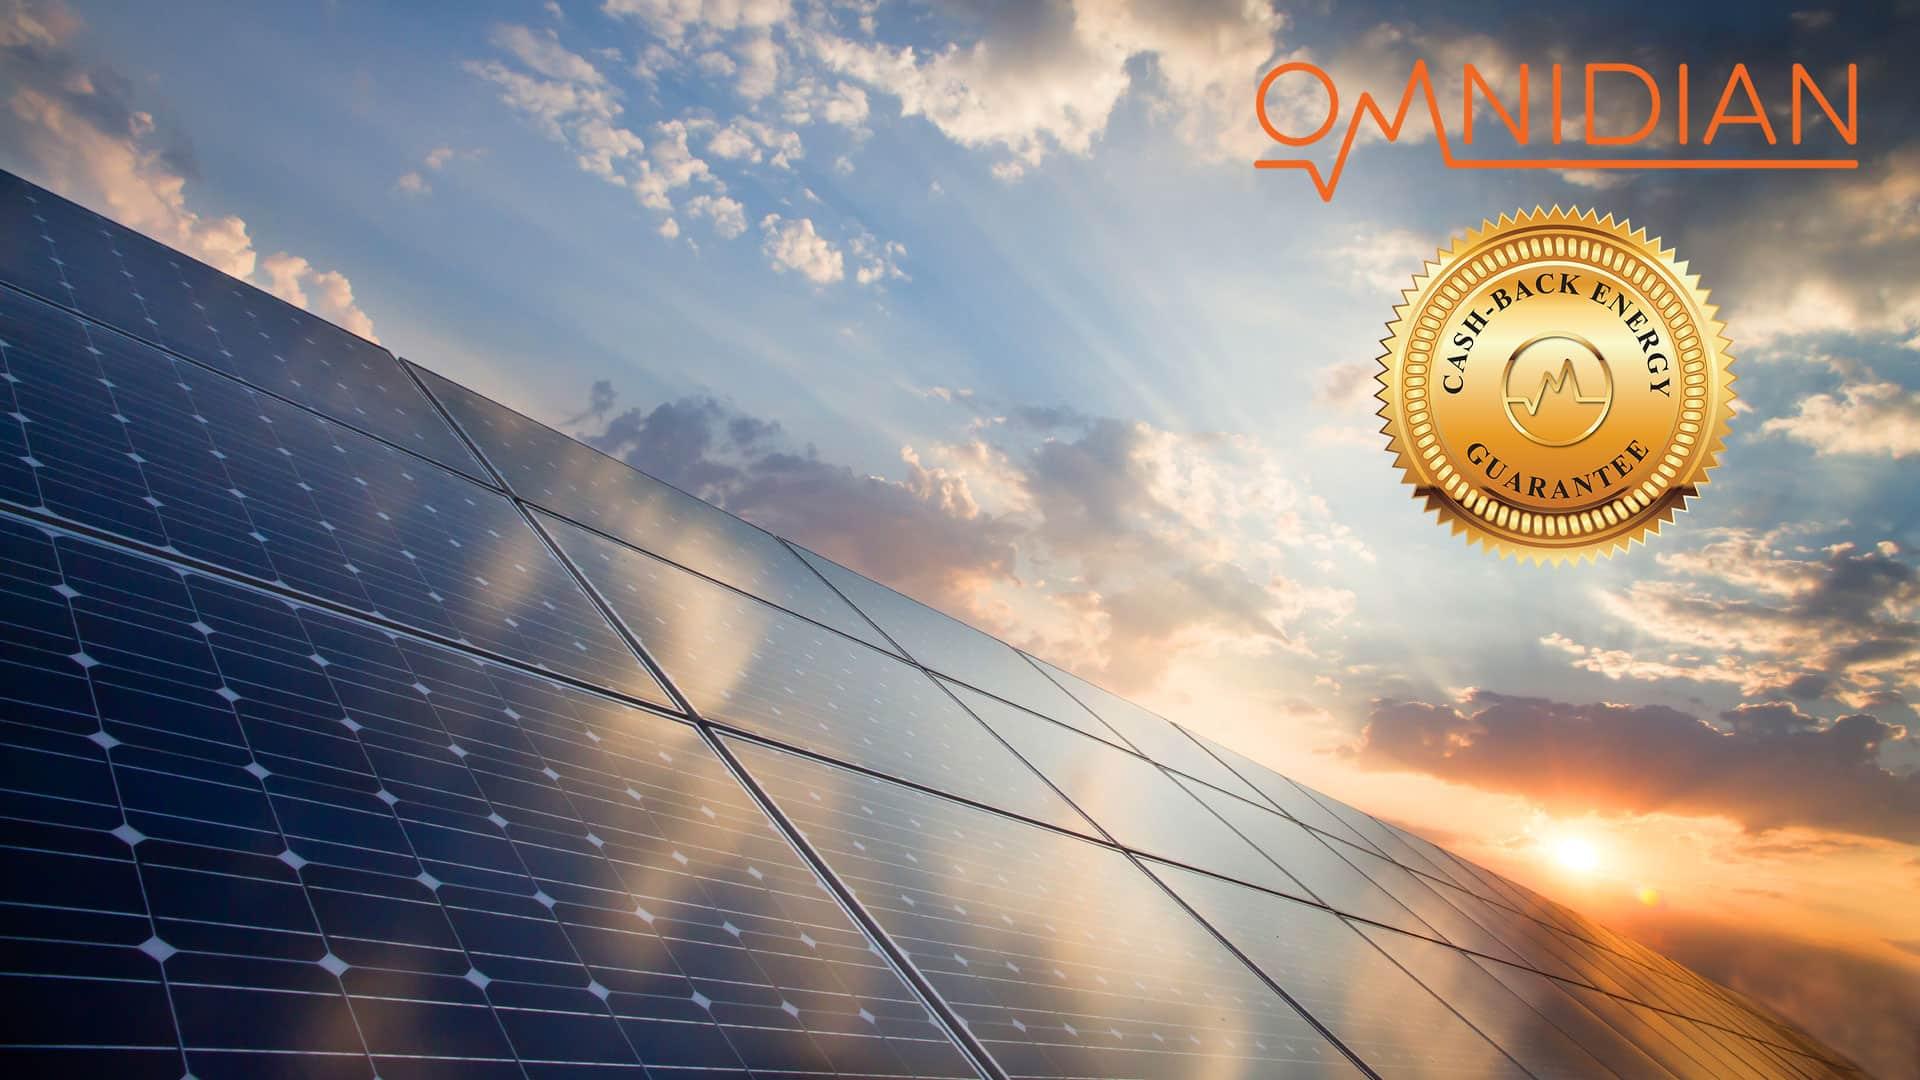 omnidian-solar-dealer